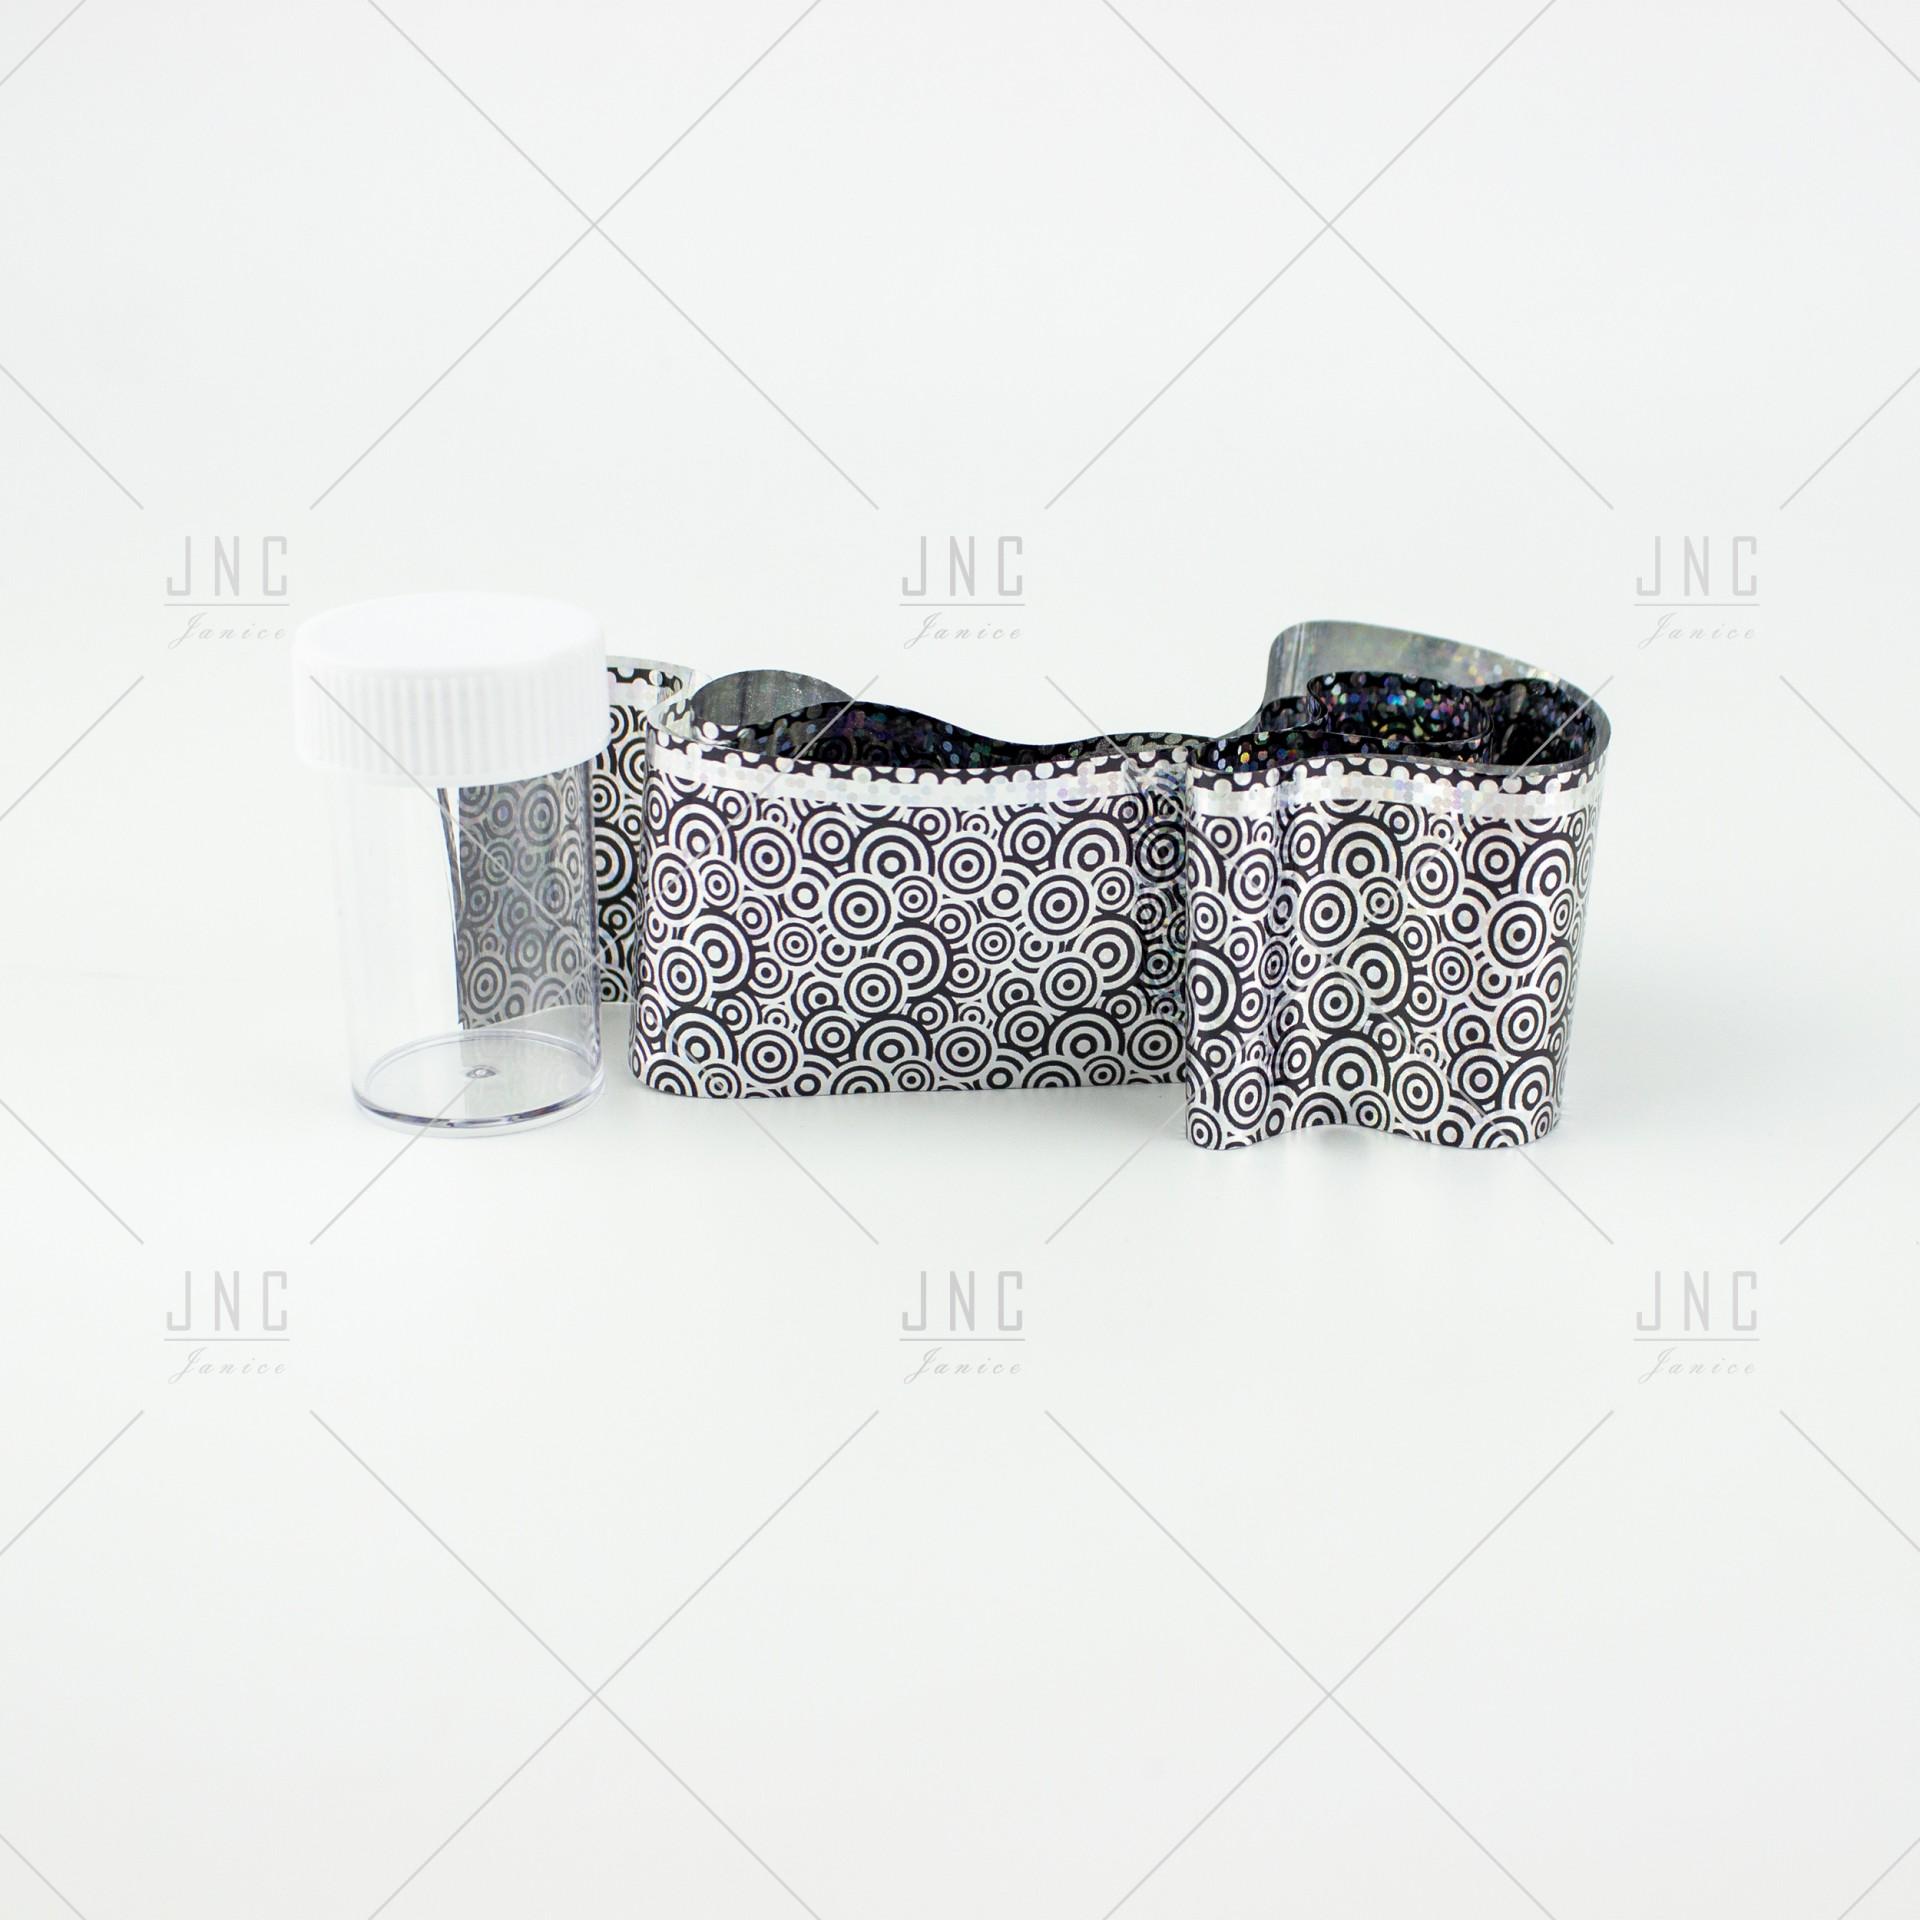 Foil Nail Art - #6 | Ref.861365